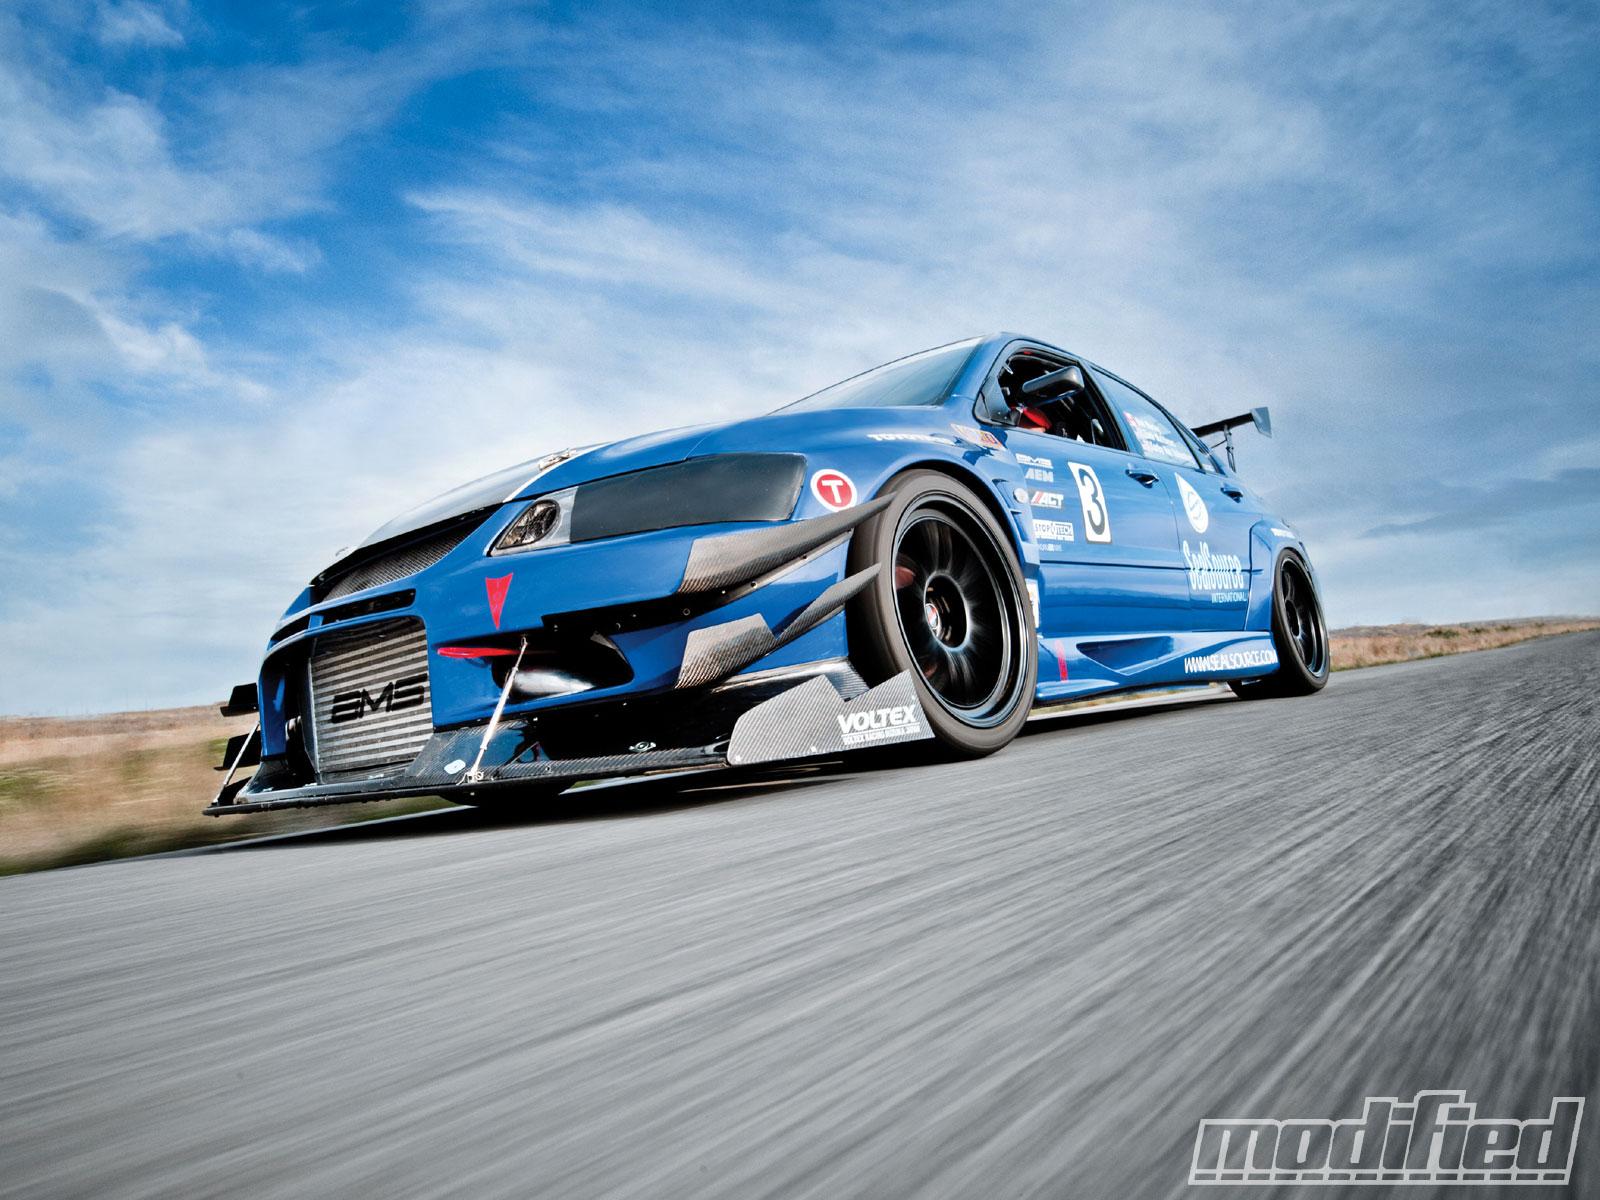 2003 Mitsubishi Evolution XIII - Garage-Built Monster Photo